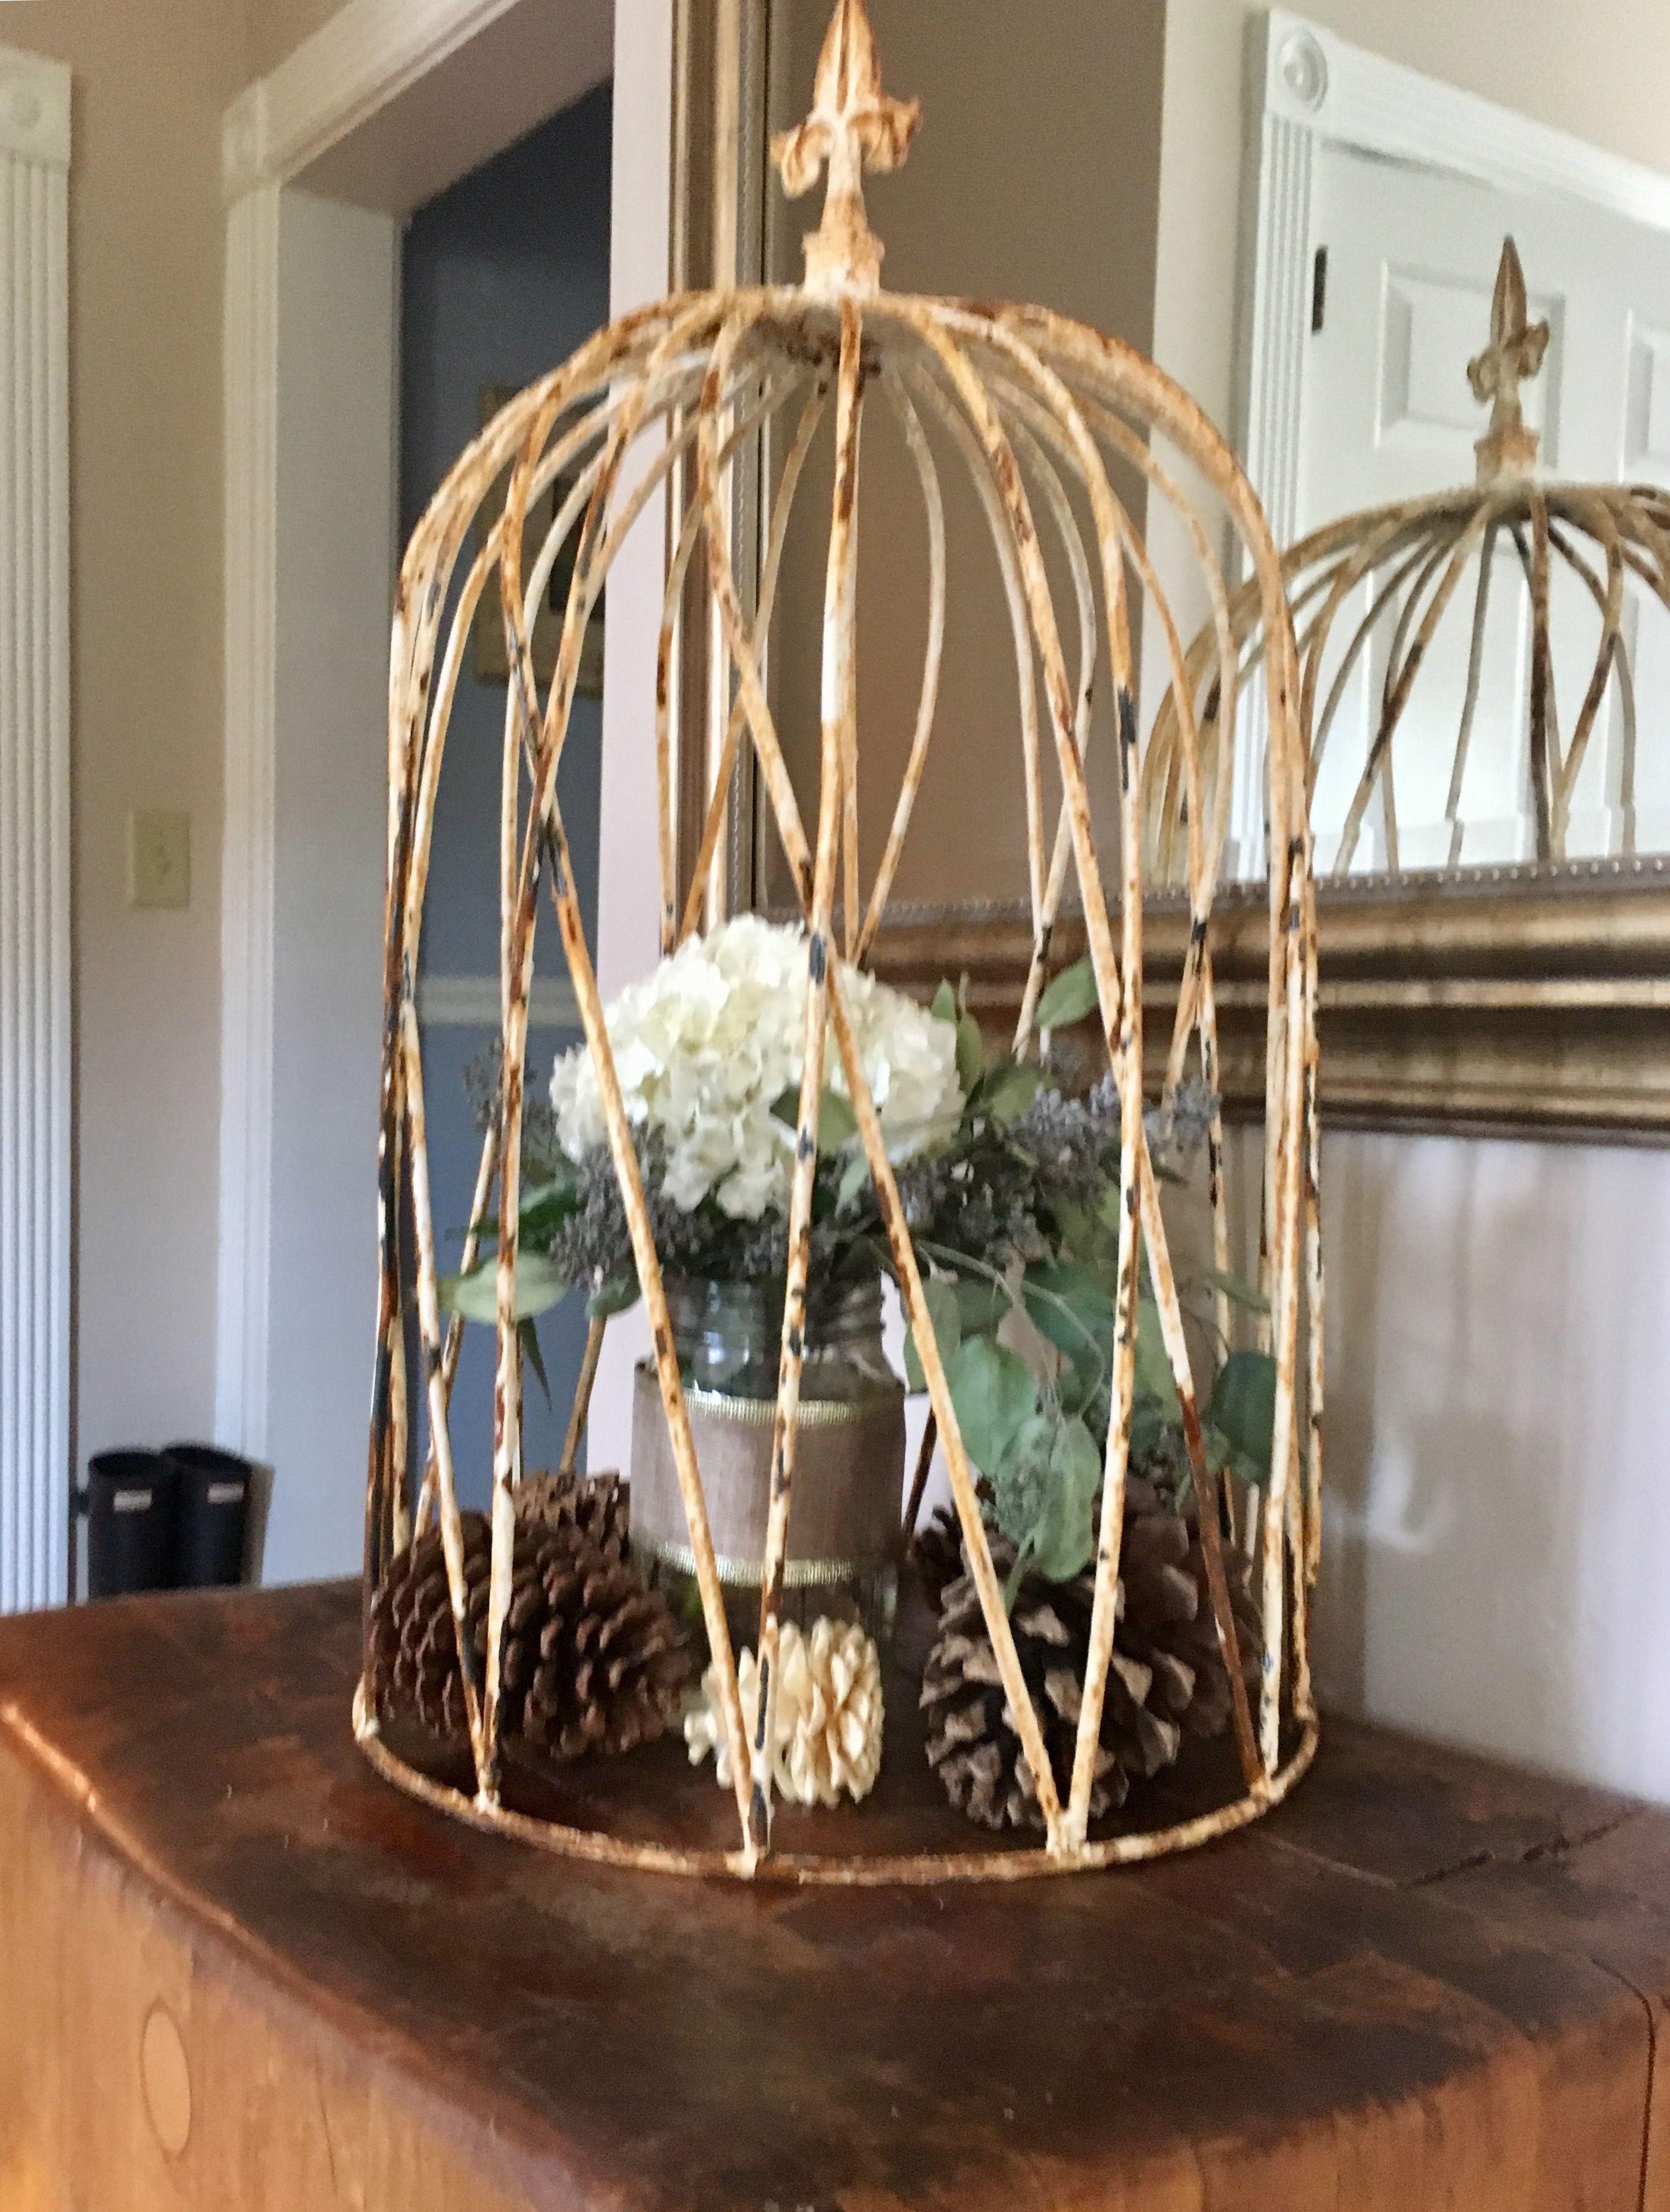 Wrought Iron Dome Cloche! Prefect for gardens, flowers, fall decor ...